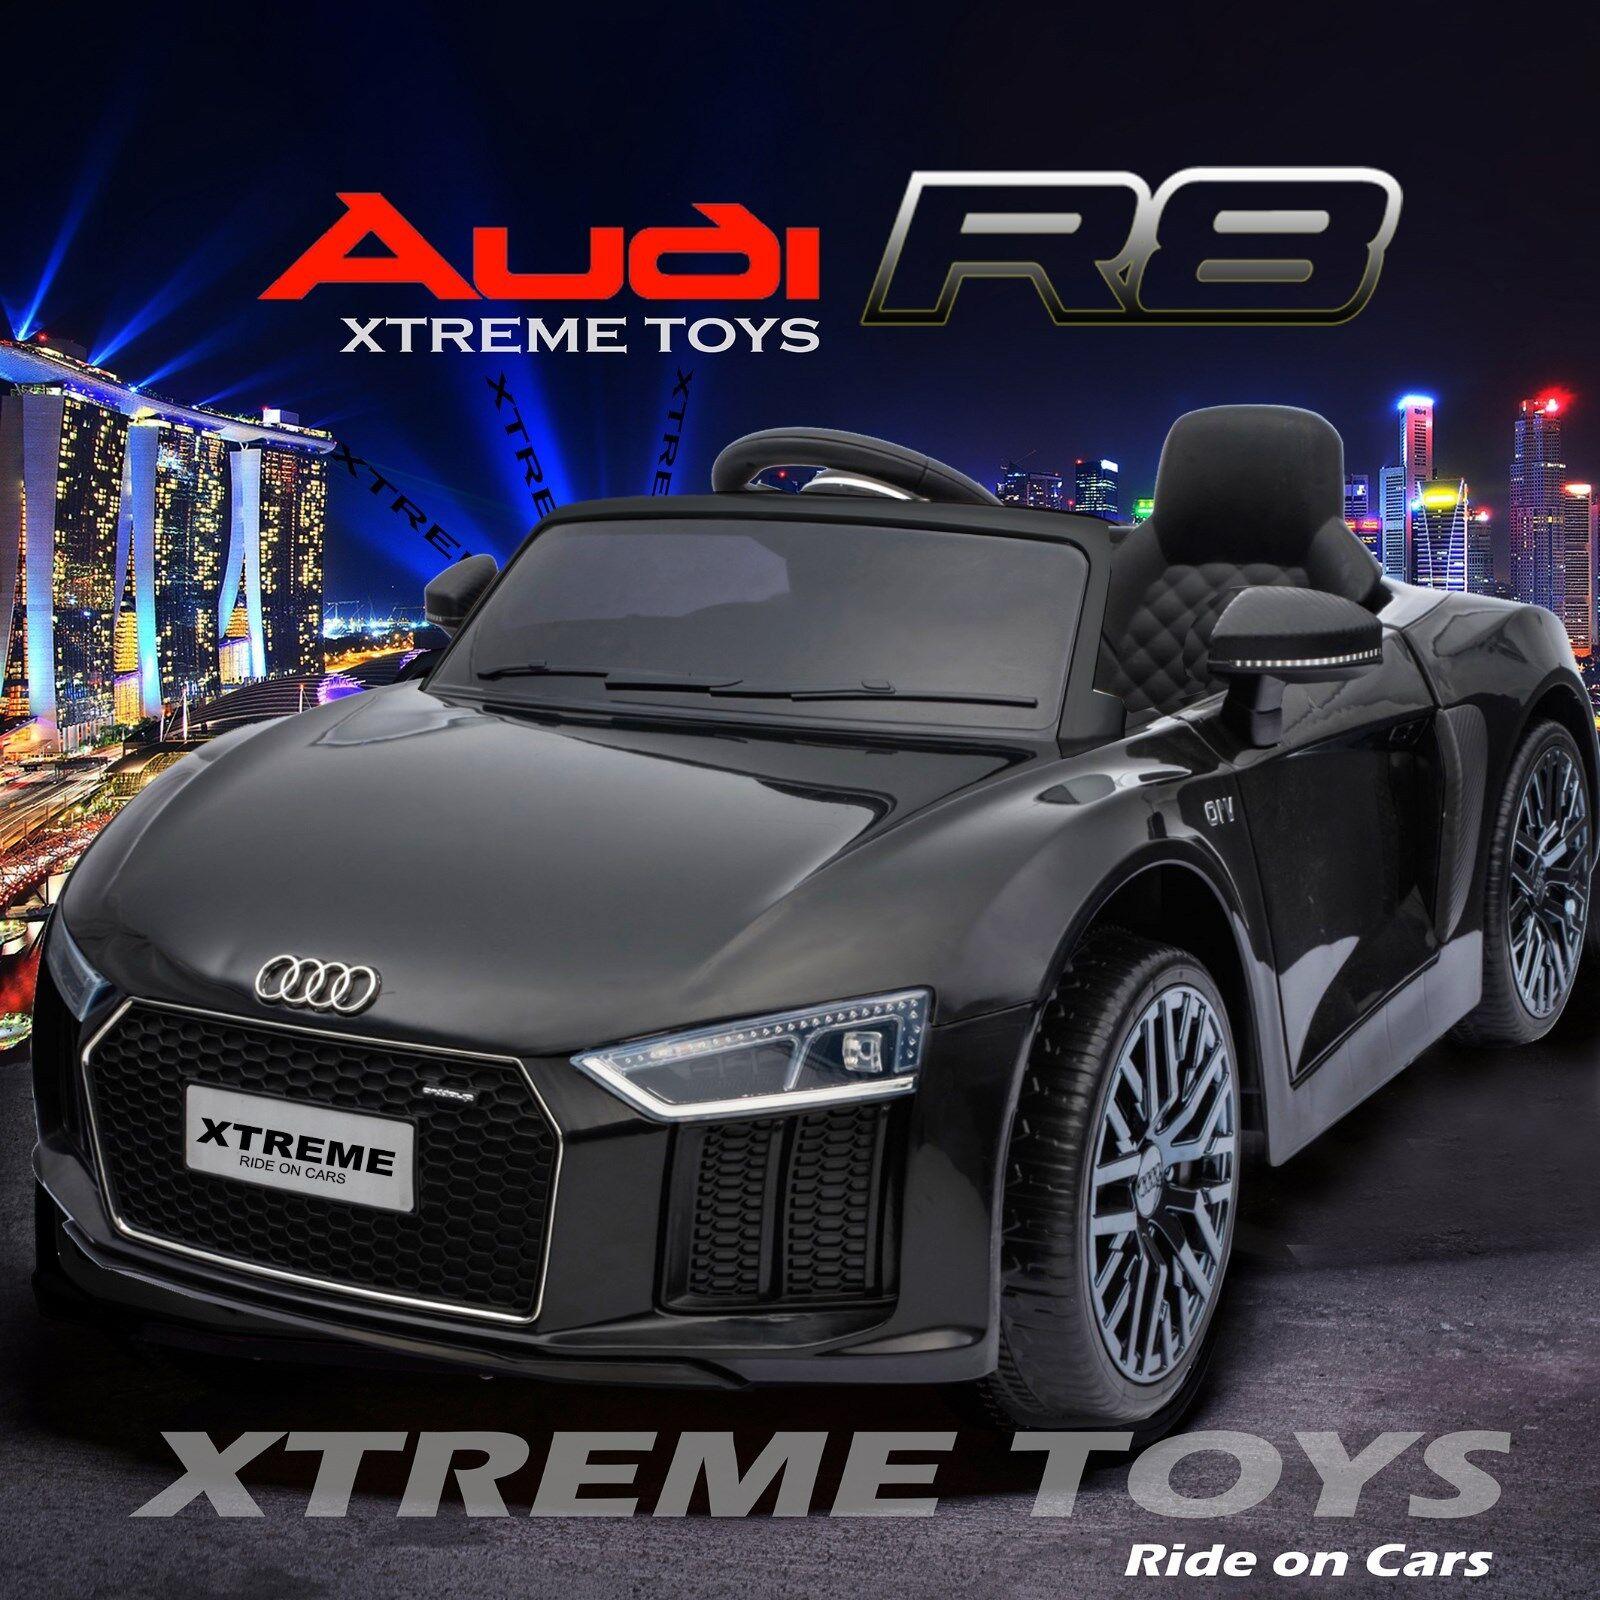 New 2019 Xtreme Childs Kids Big 12v Licensed Ride On Audi R8